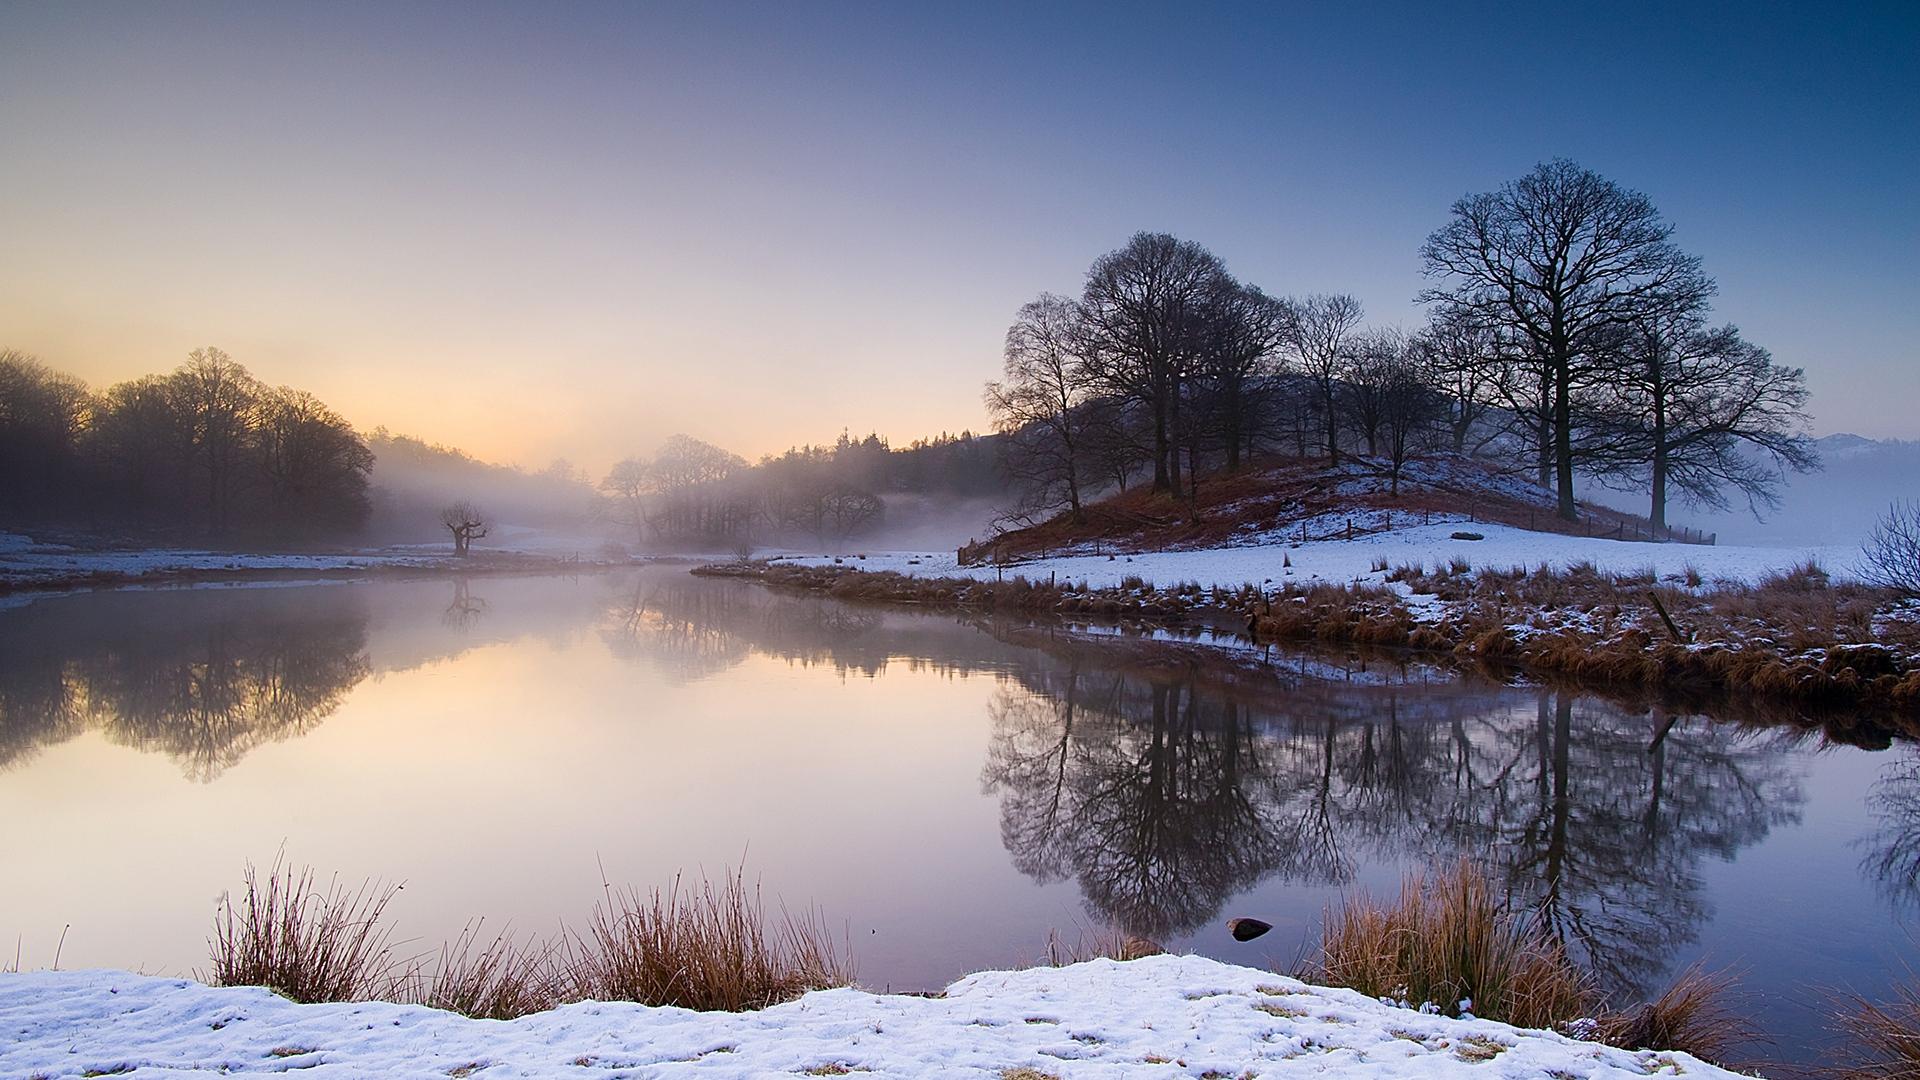 Download Wallpaper Minecraft Winter - lake_fog_morning_winter_14924_1920x1080  Collection_426263.jpg